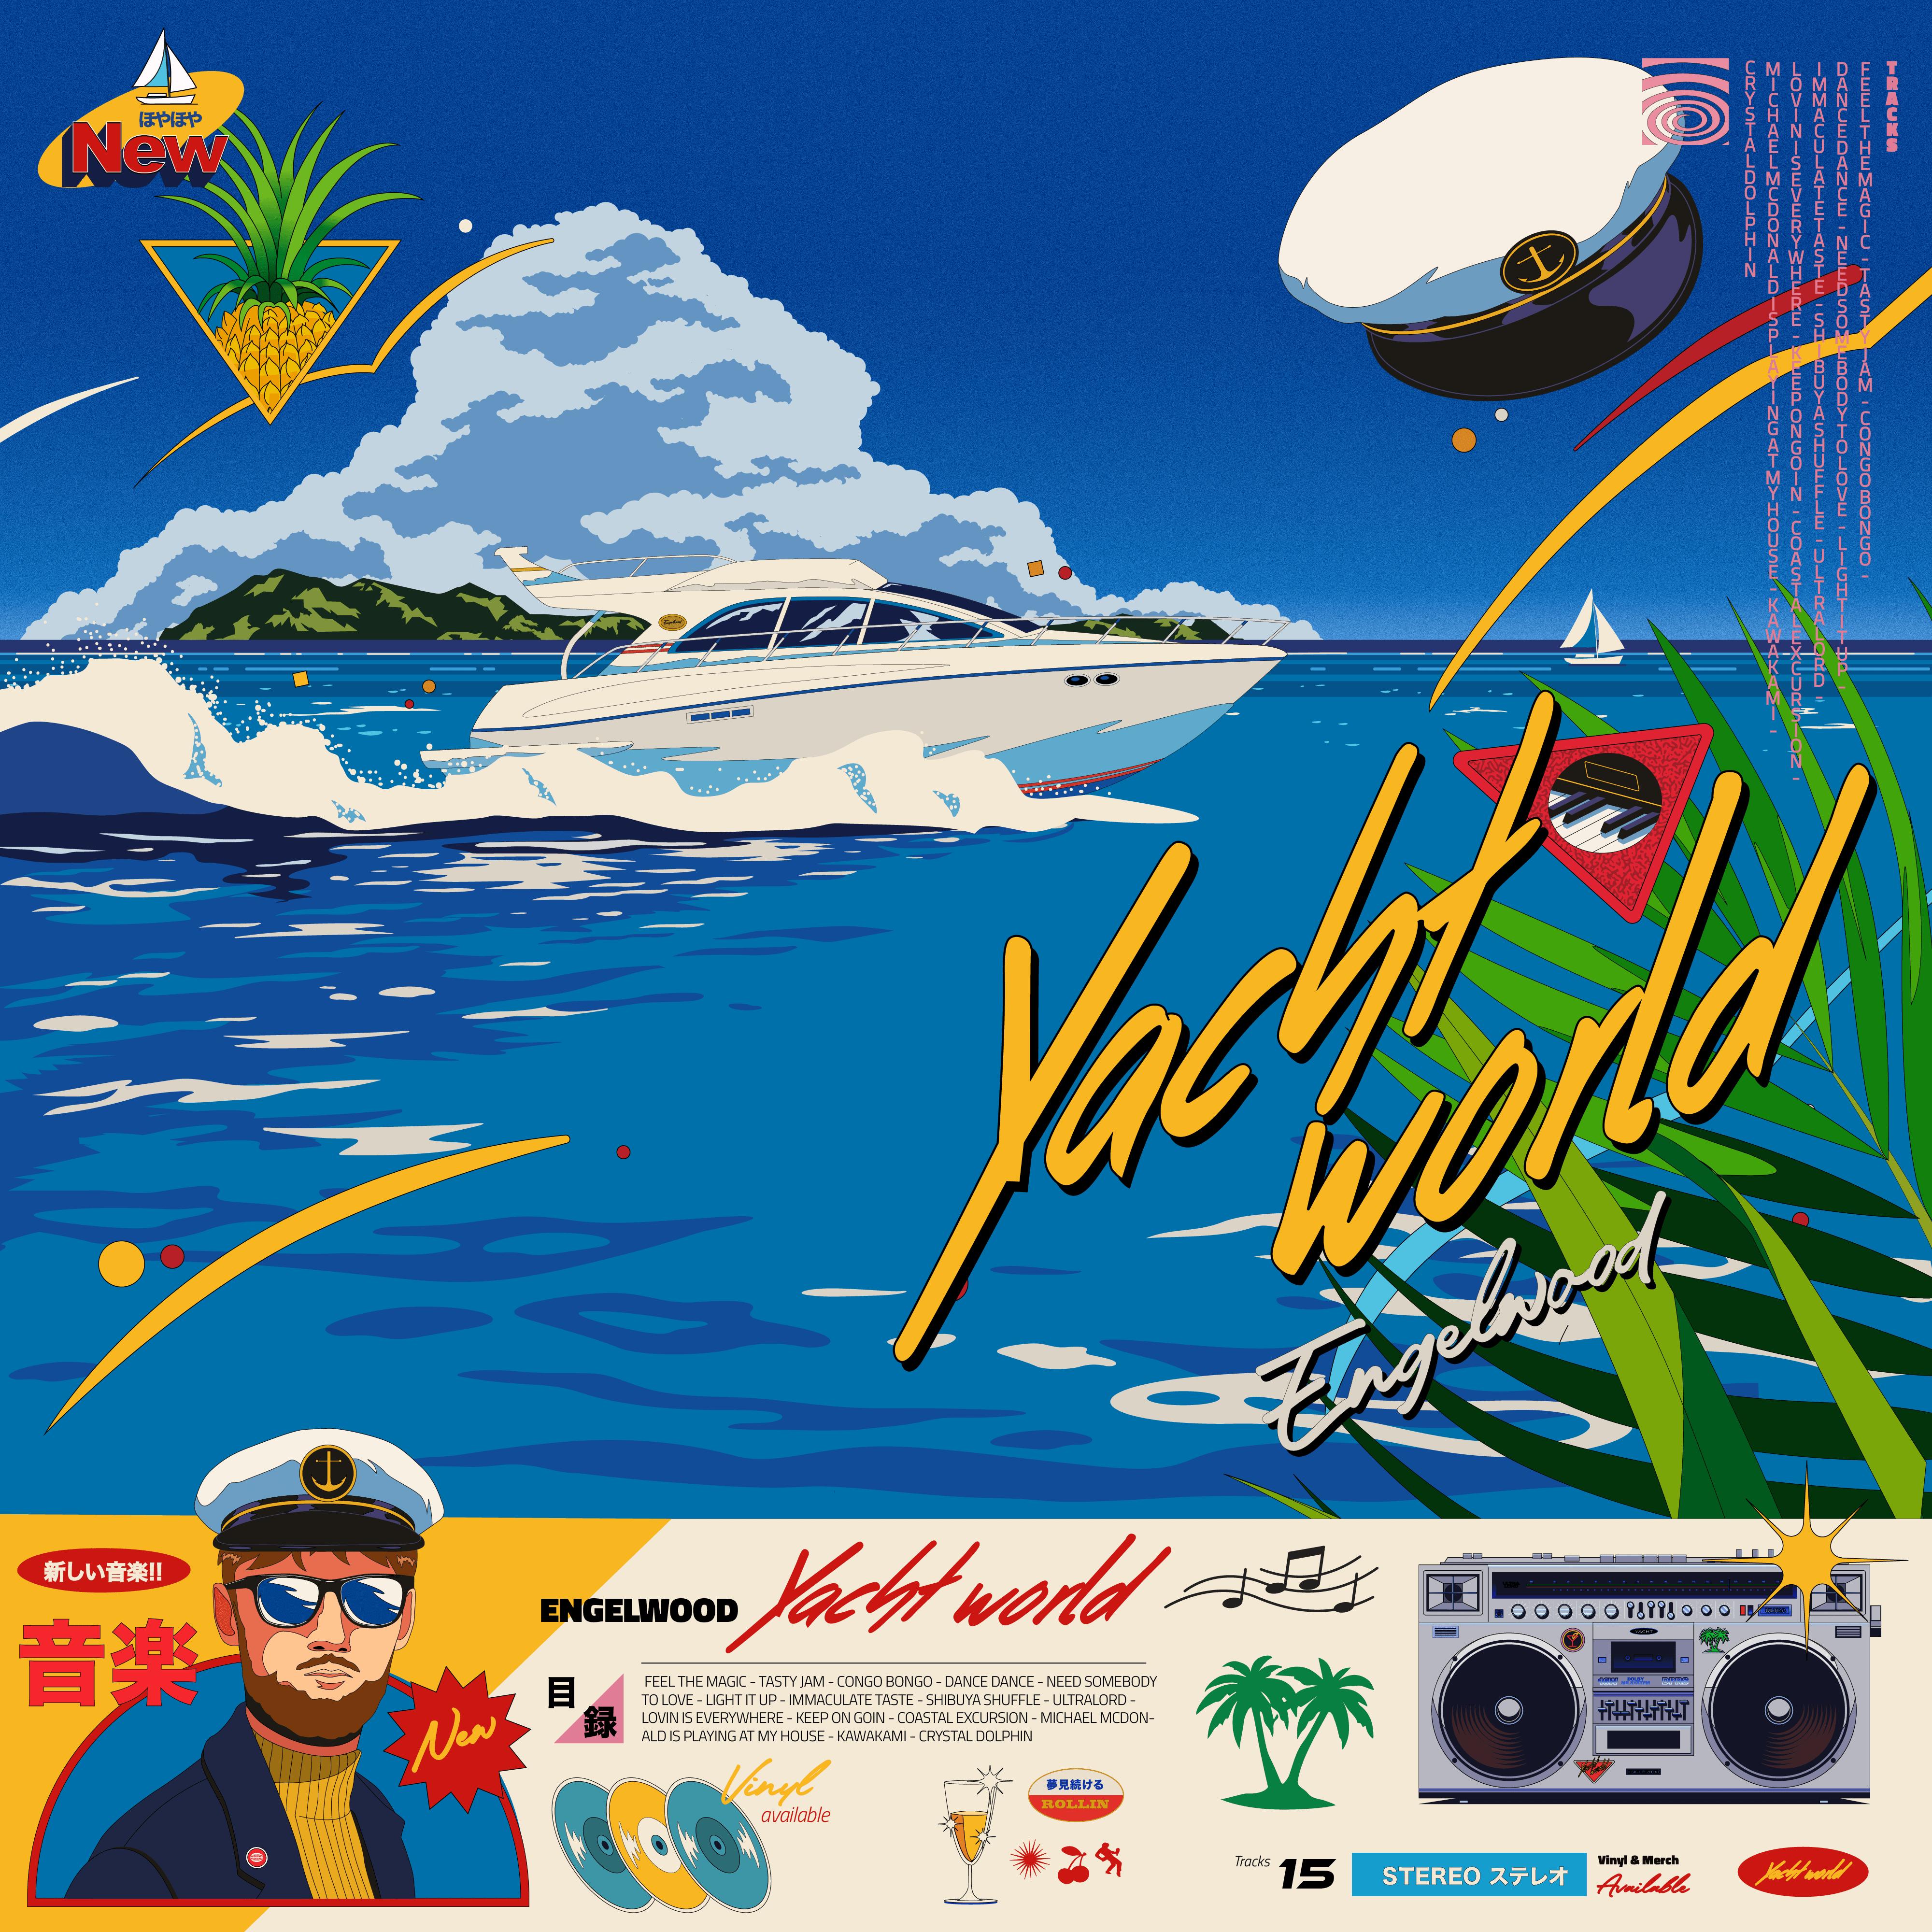 YACHT_WORLD_ALBUM